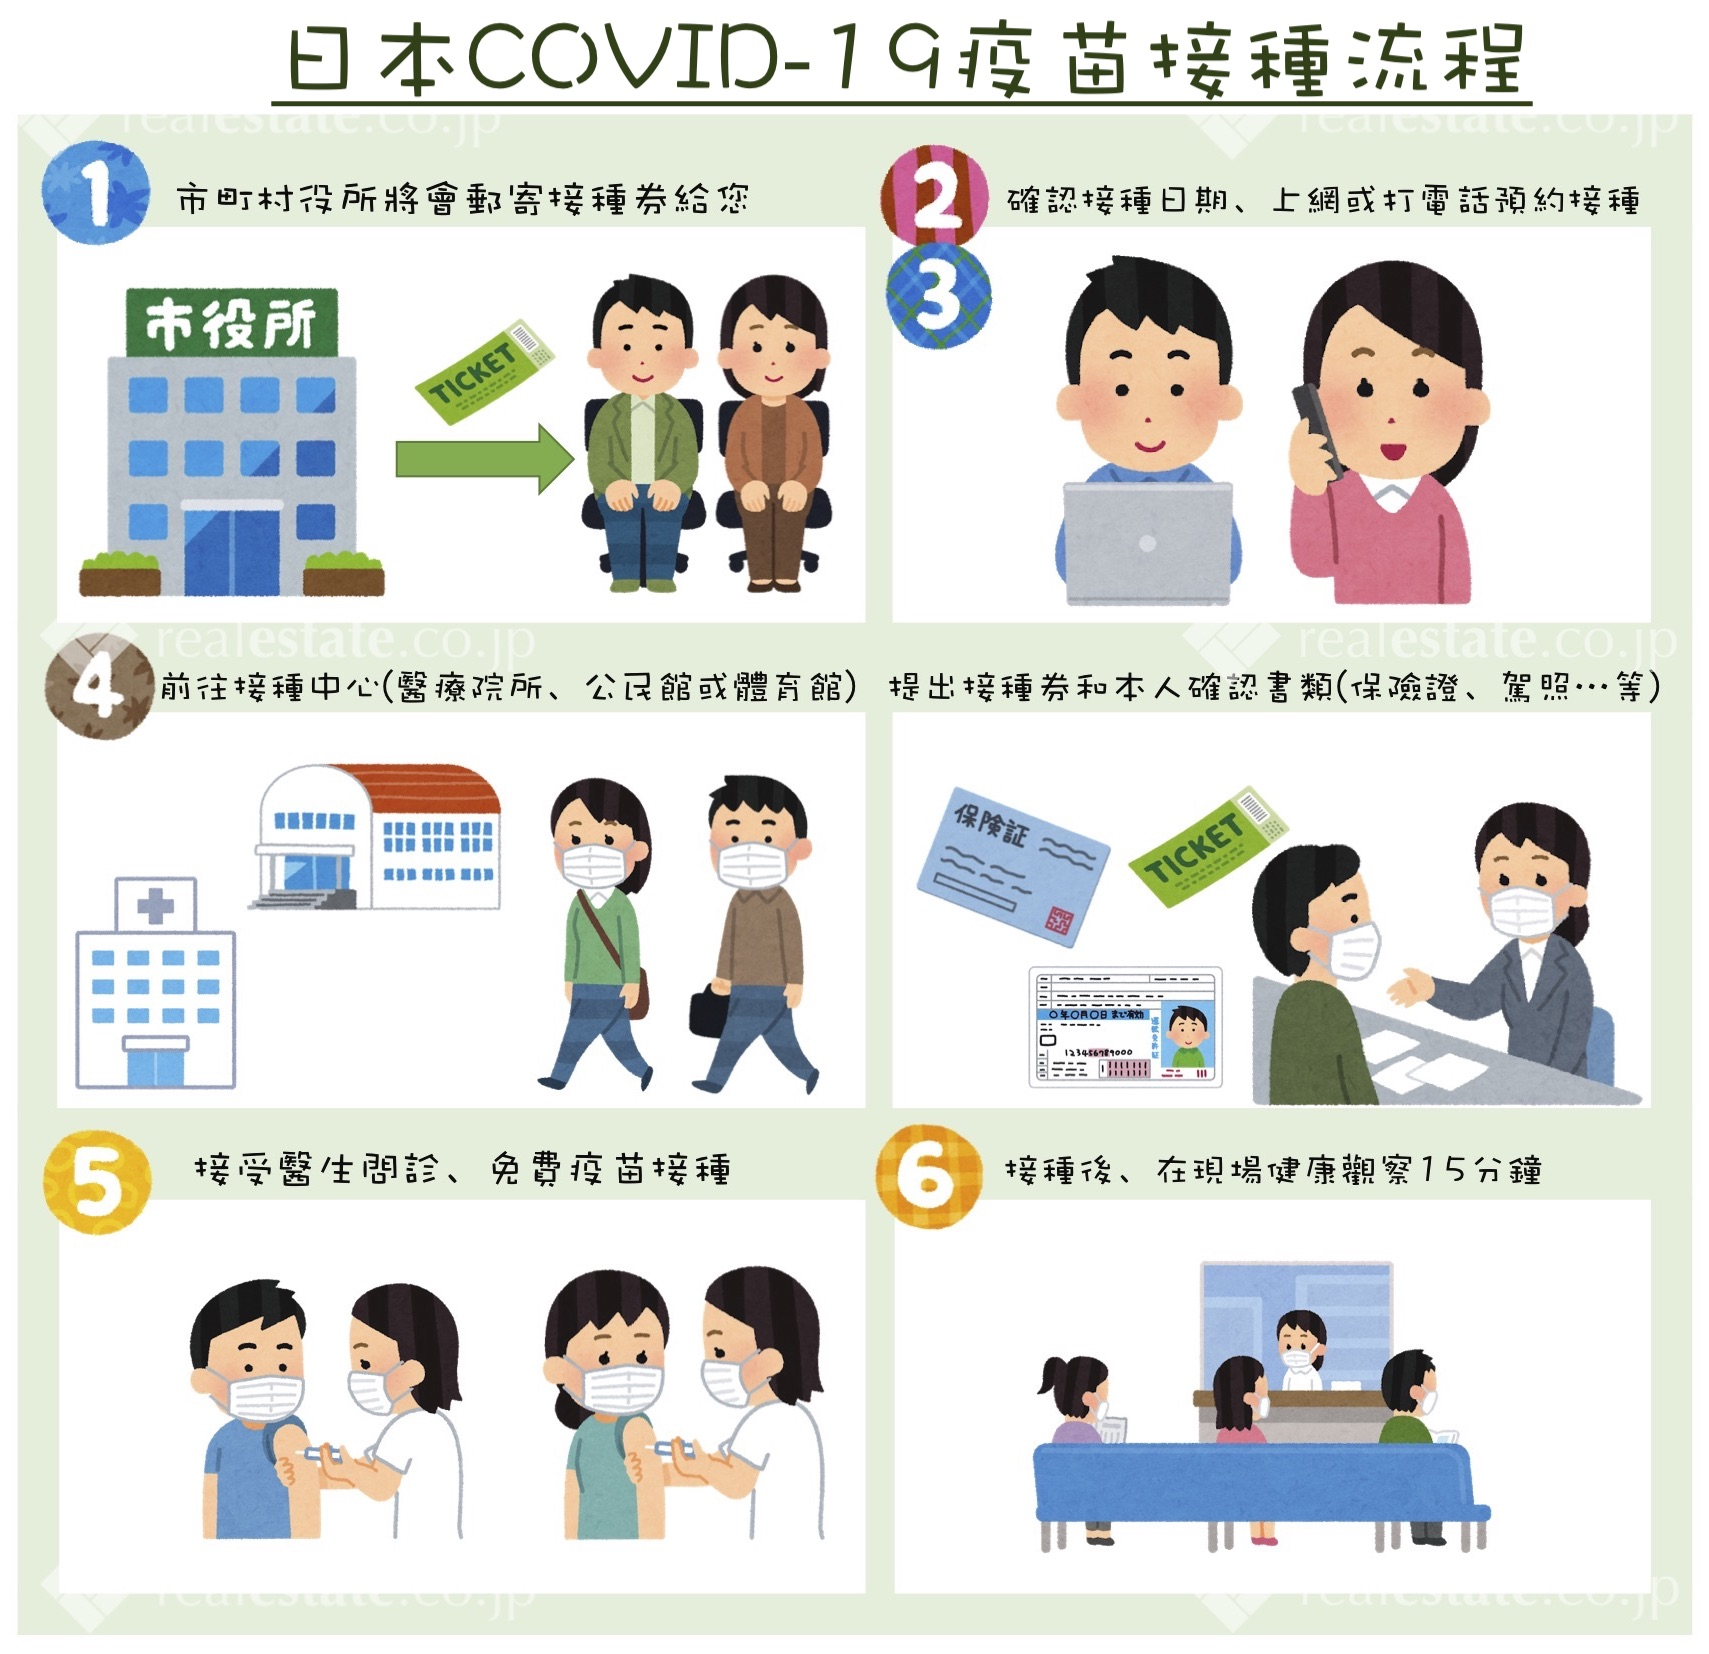 日本COVID-19疫苗接種流程-realestate.co.jp